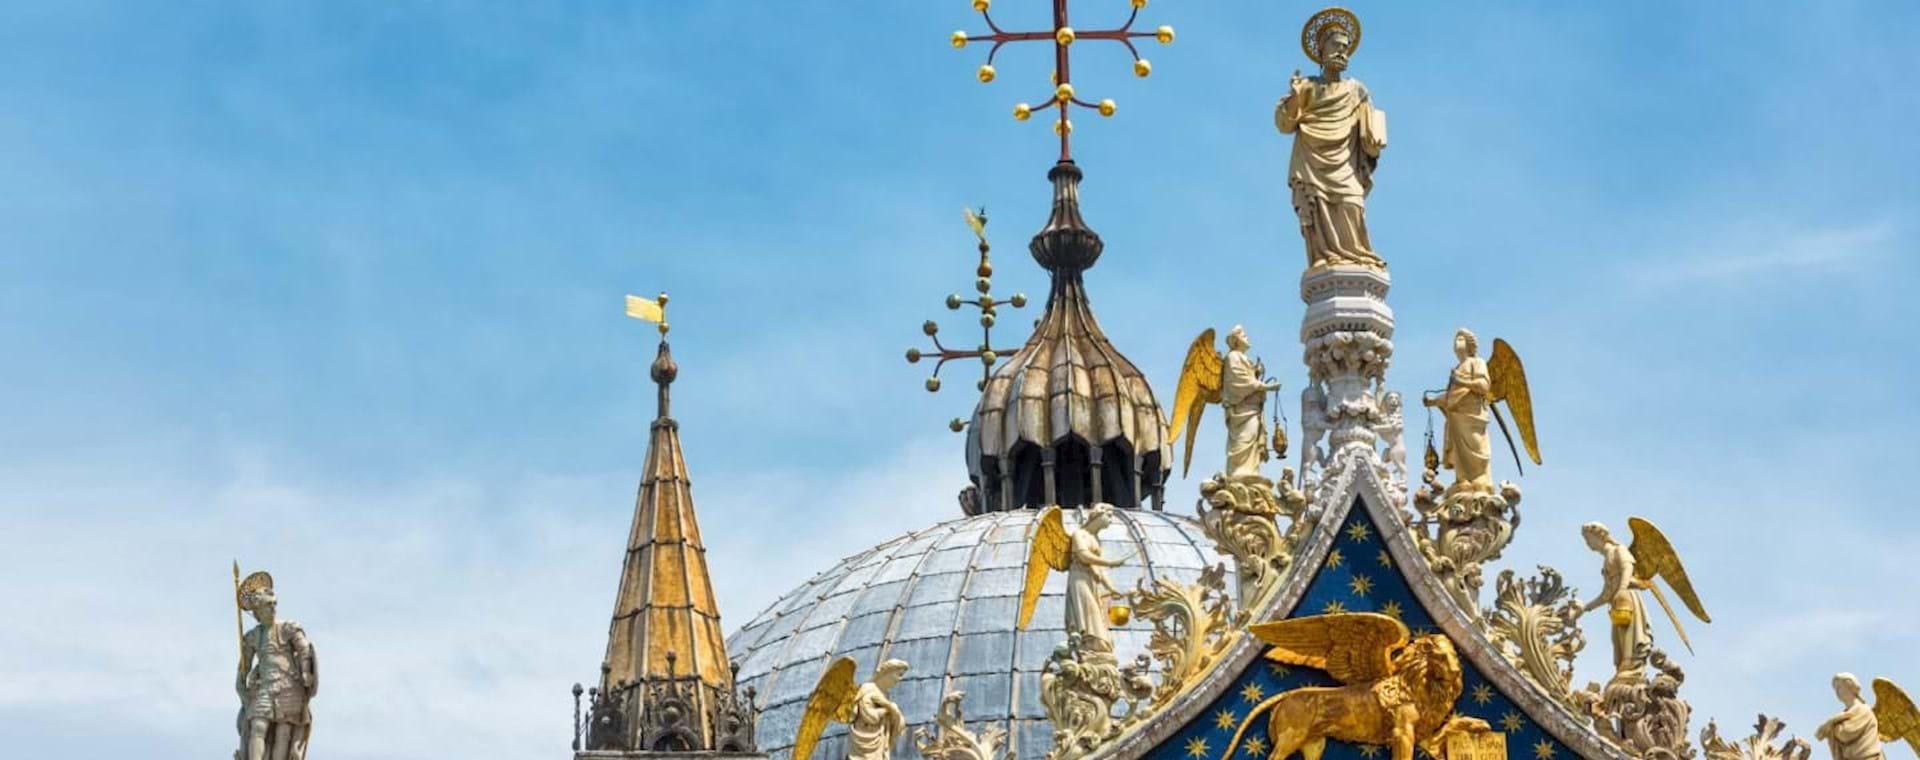 St. Mark's Basilica & Terraces Express Tour